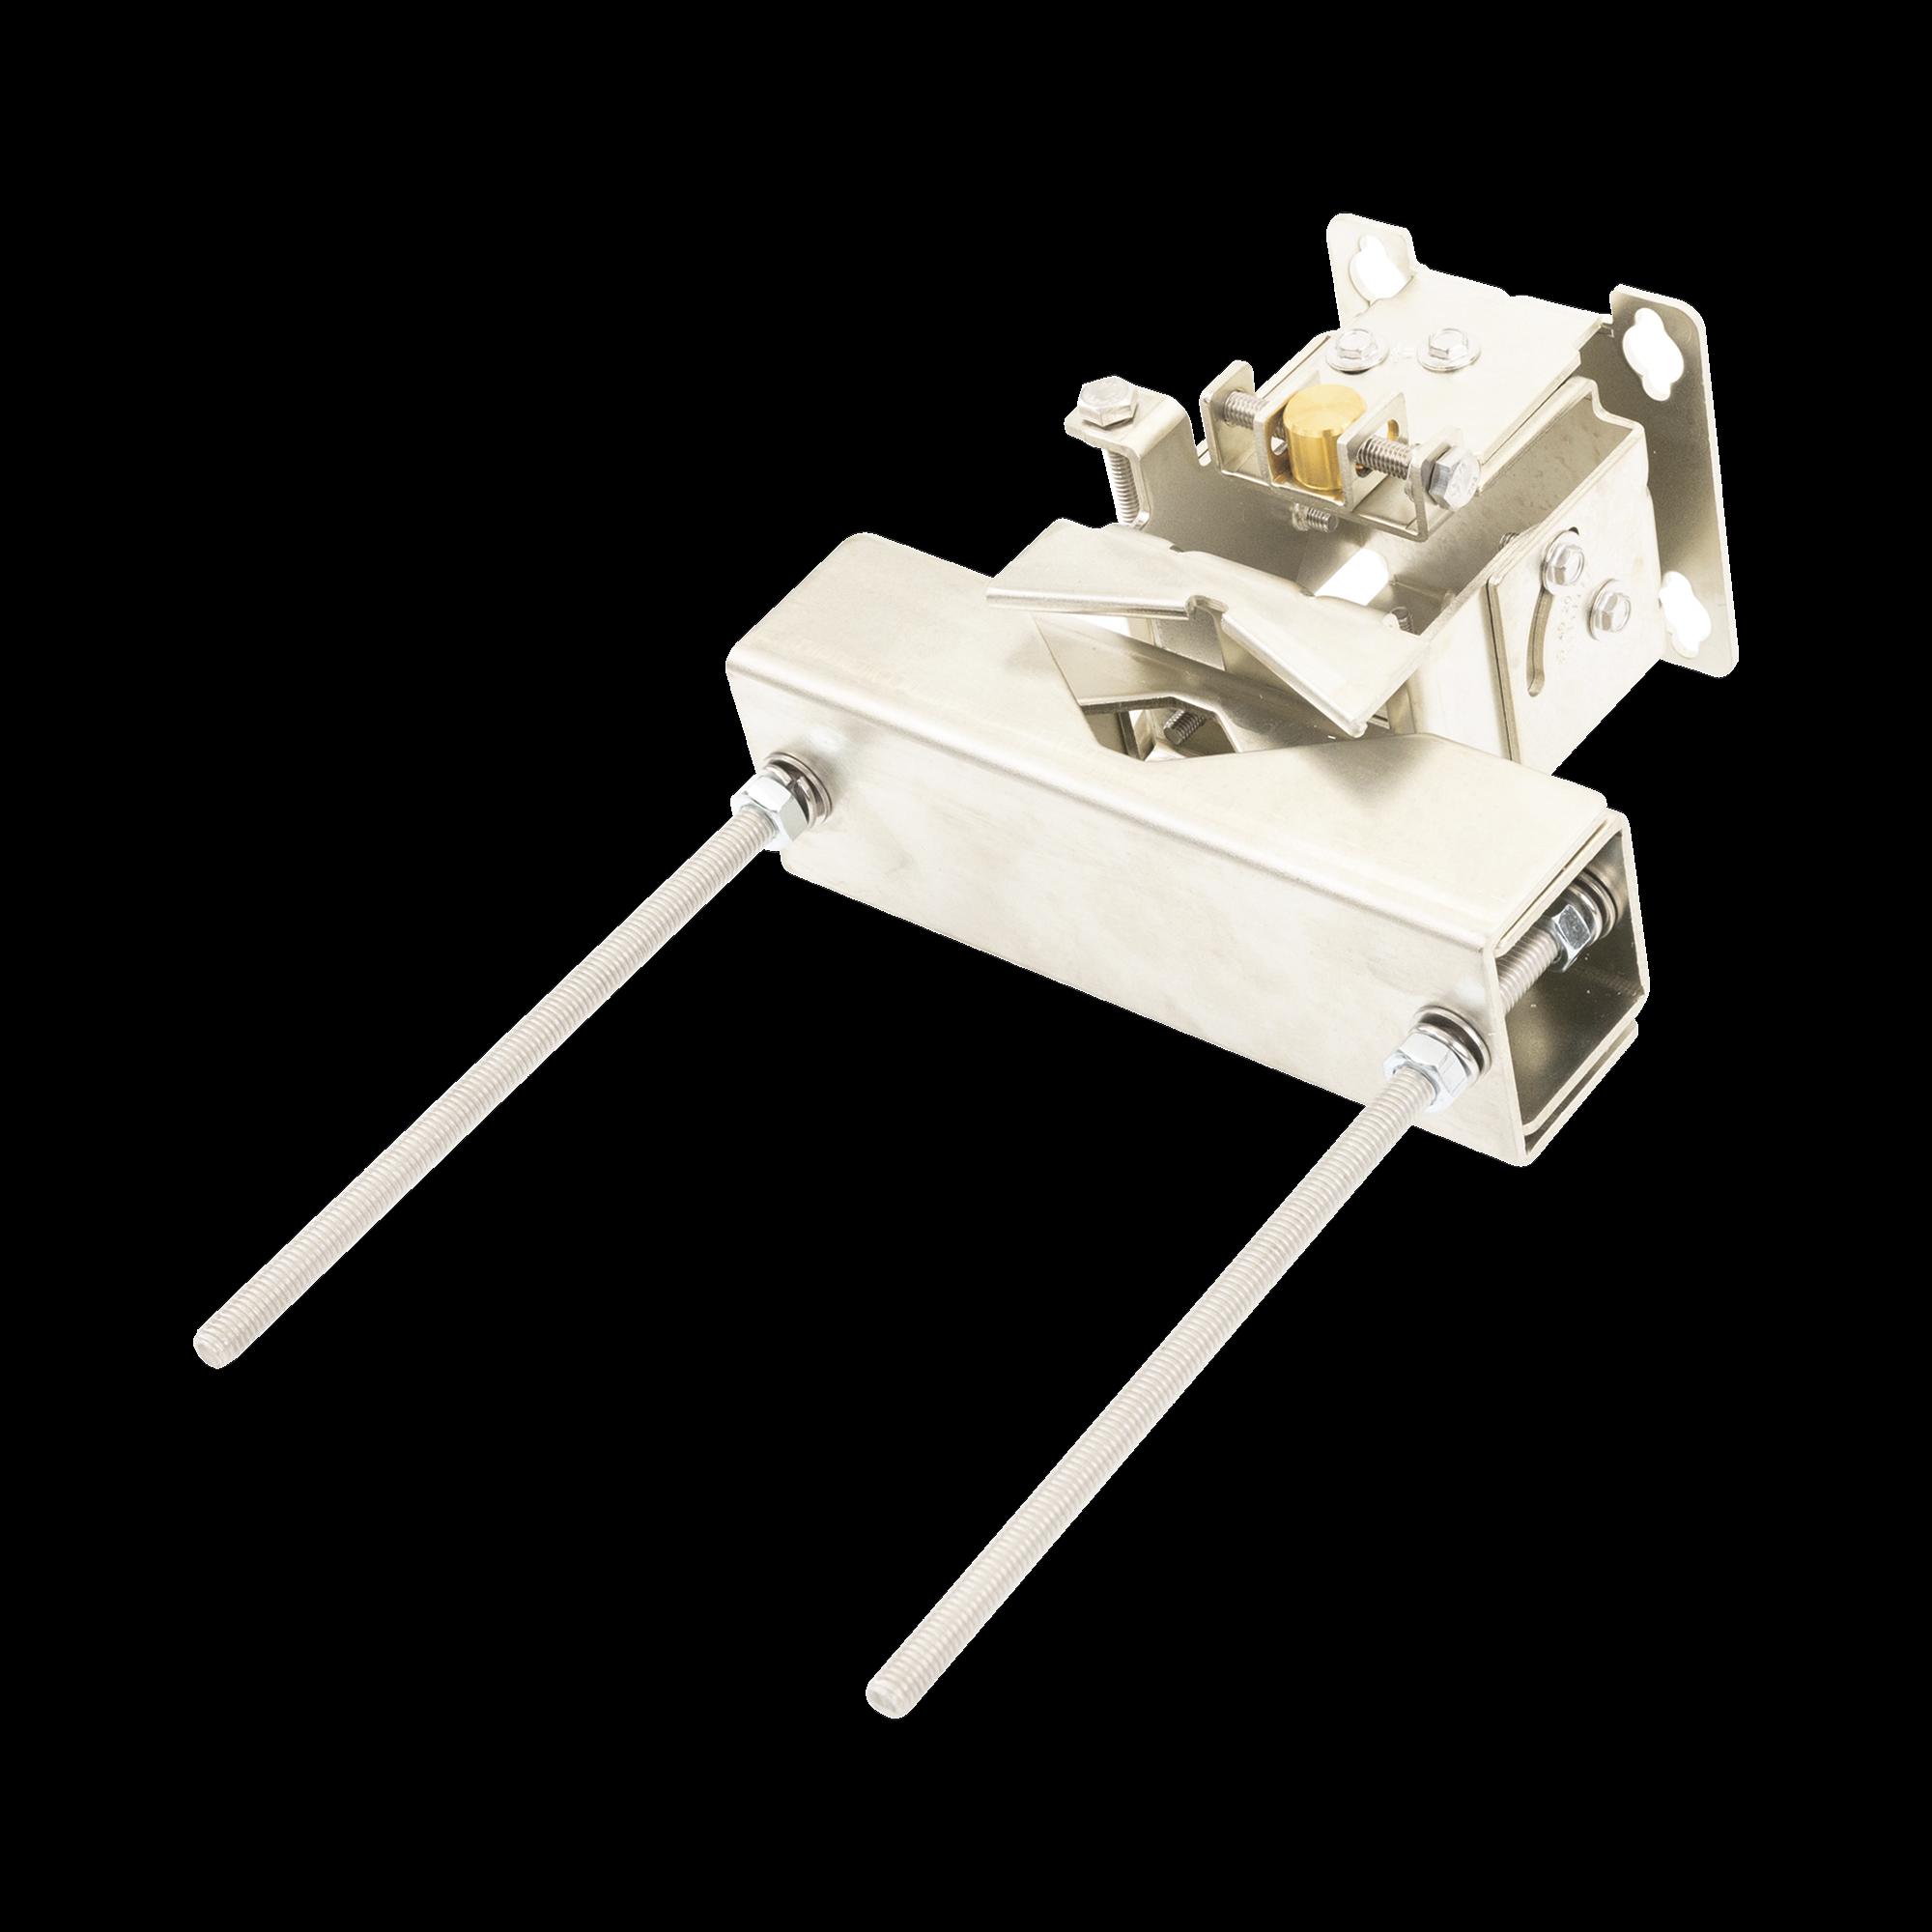 Kit de montaje etherhaul para antena de 1 FT